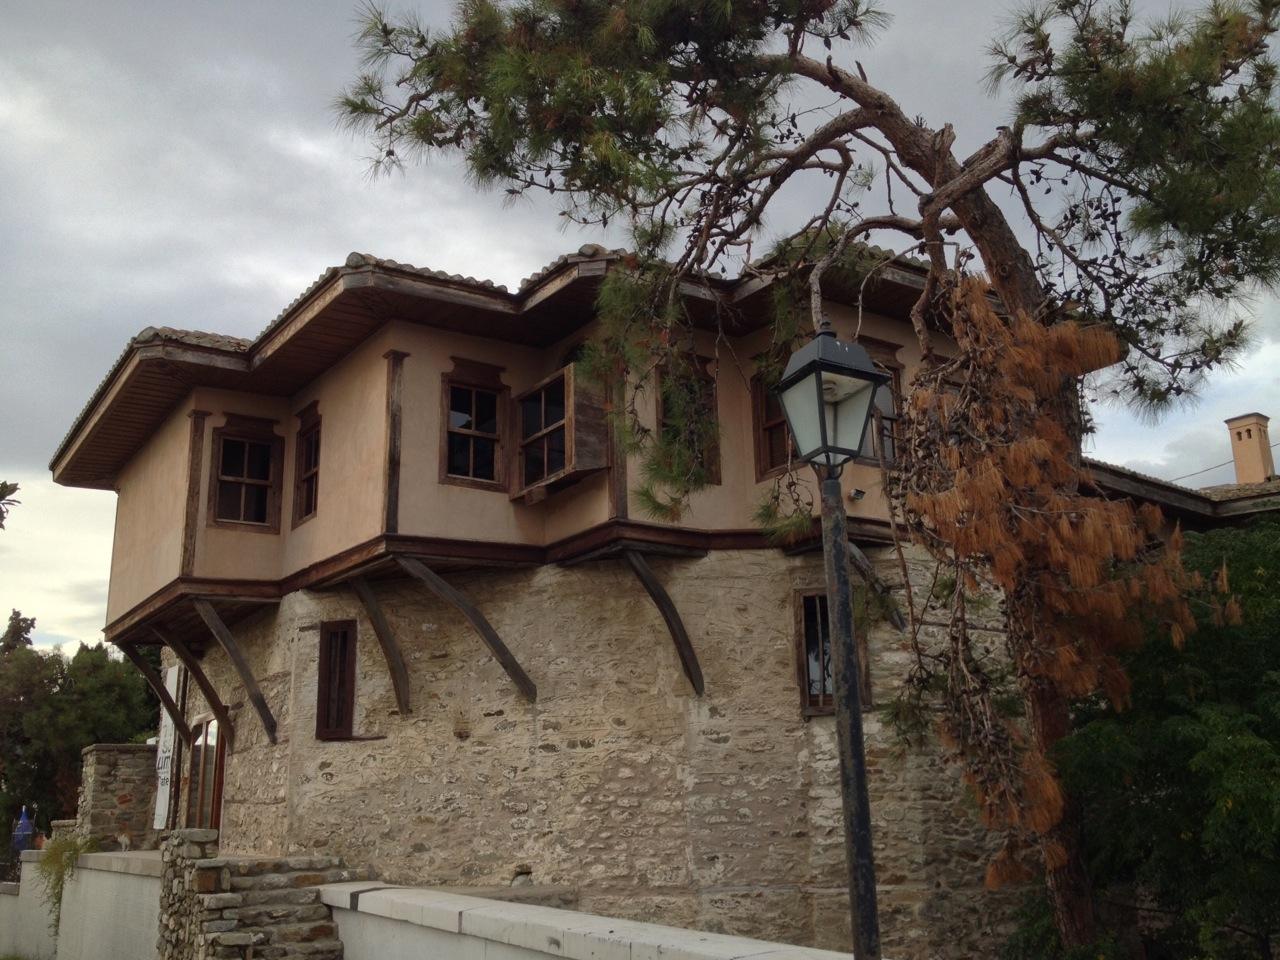 Mehmet Ali's house